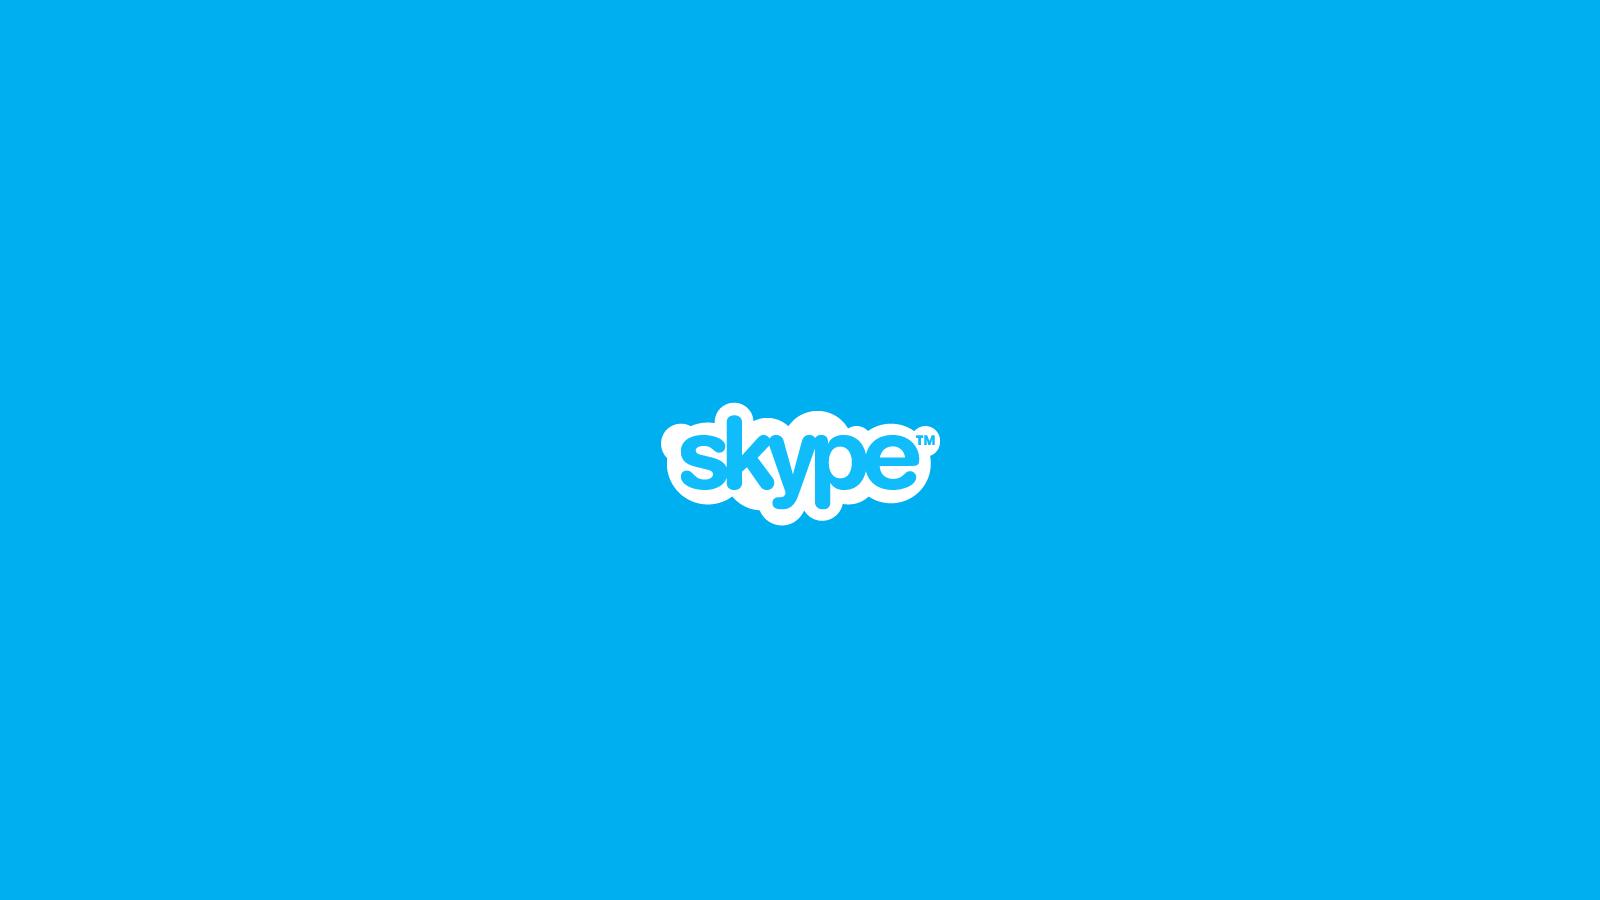 skype logo computer wallpaper 62814